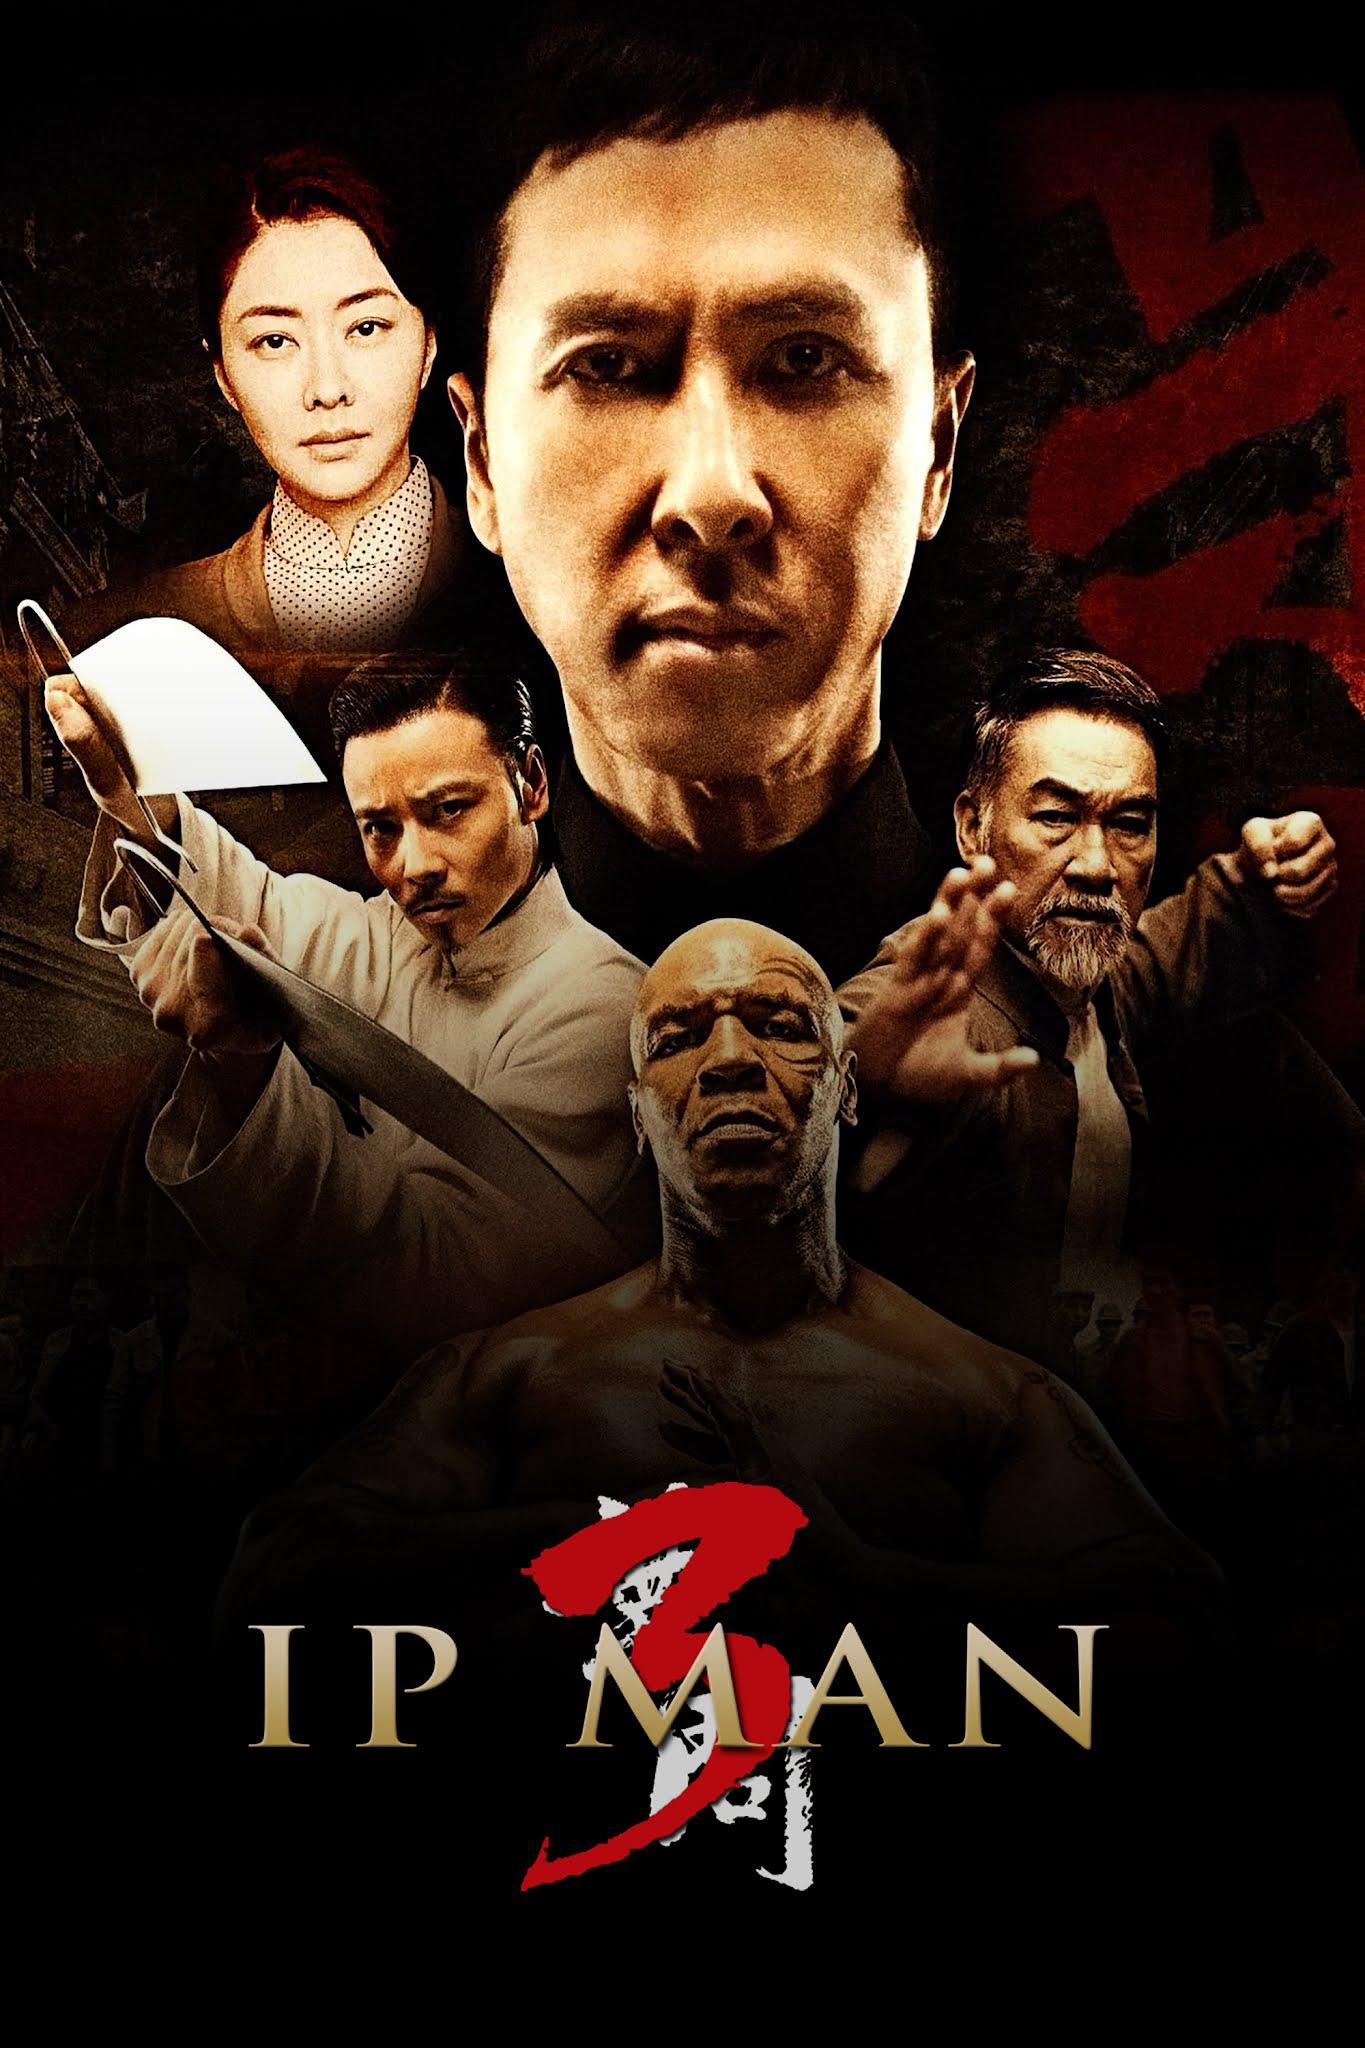 Download Ip Man 3 (2015) Full Movie in Hindi Dual Audio BluRay 480p [400MB]